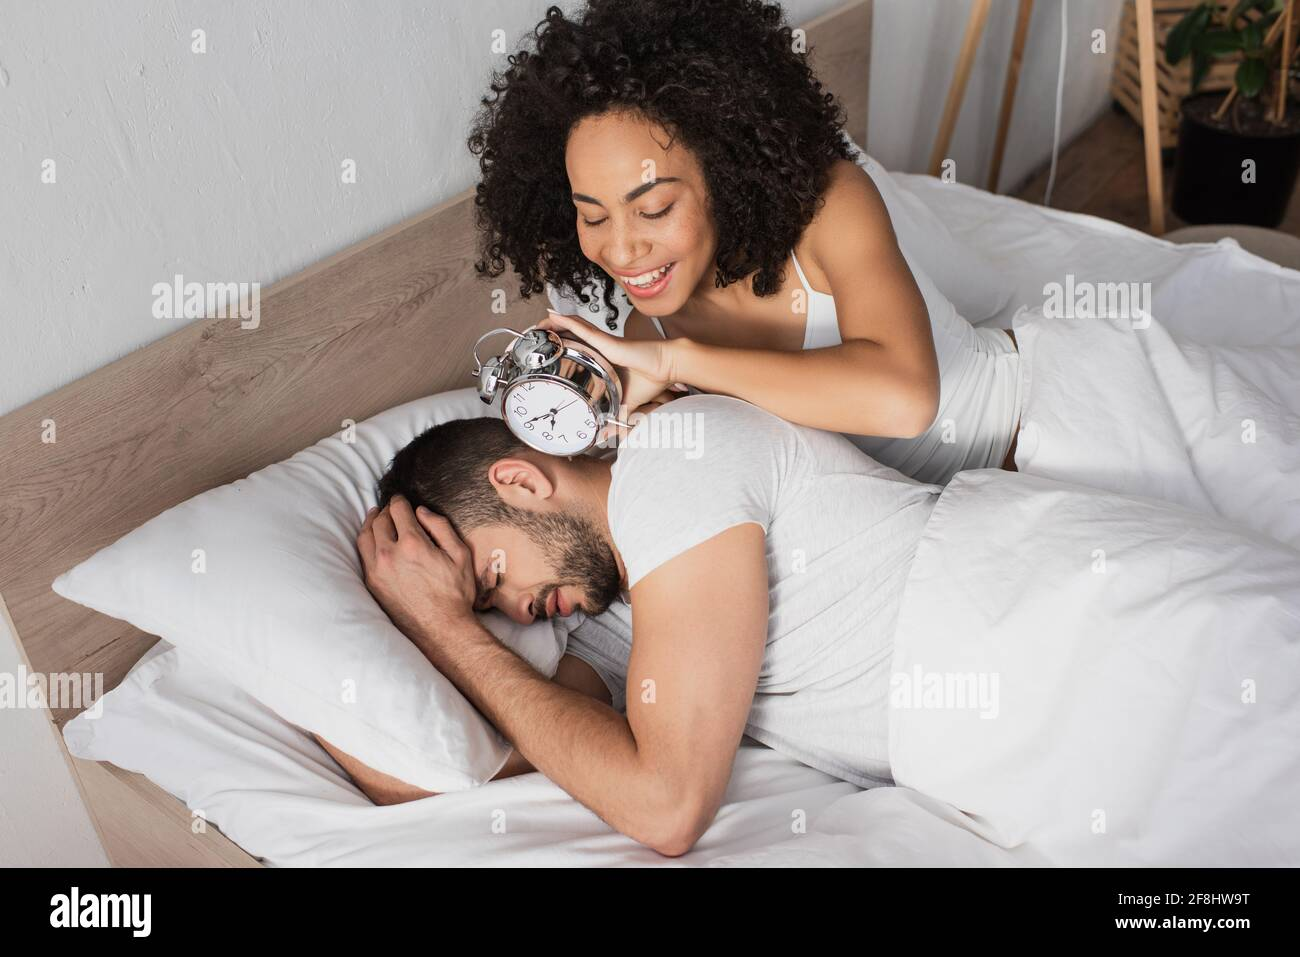 happy african american woman holding alarm clock near displeased man sleeping on bed Stock Photo